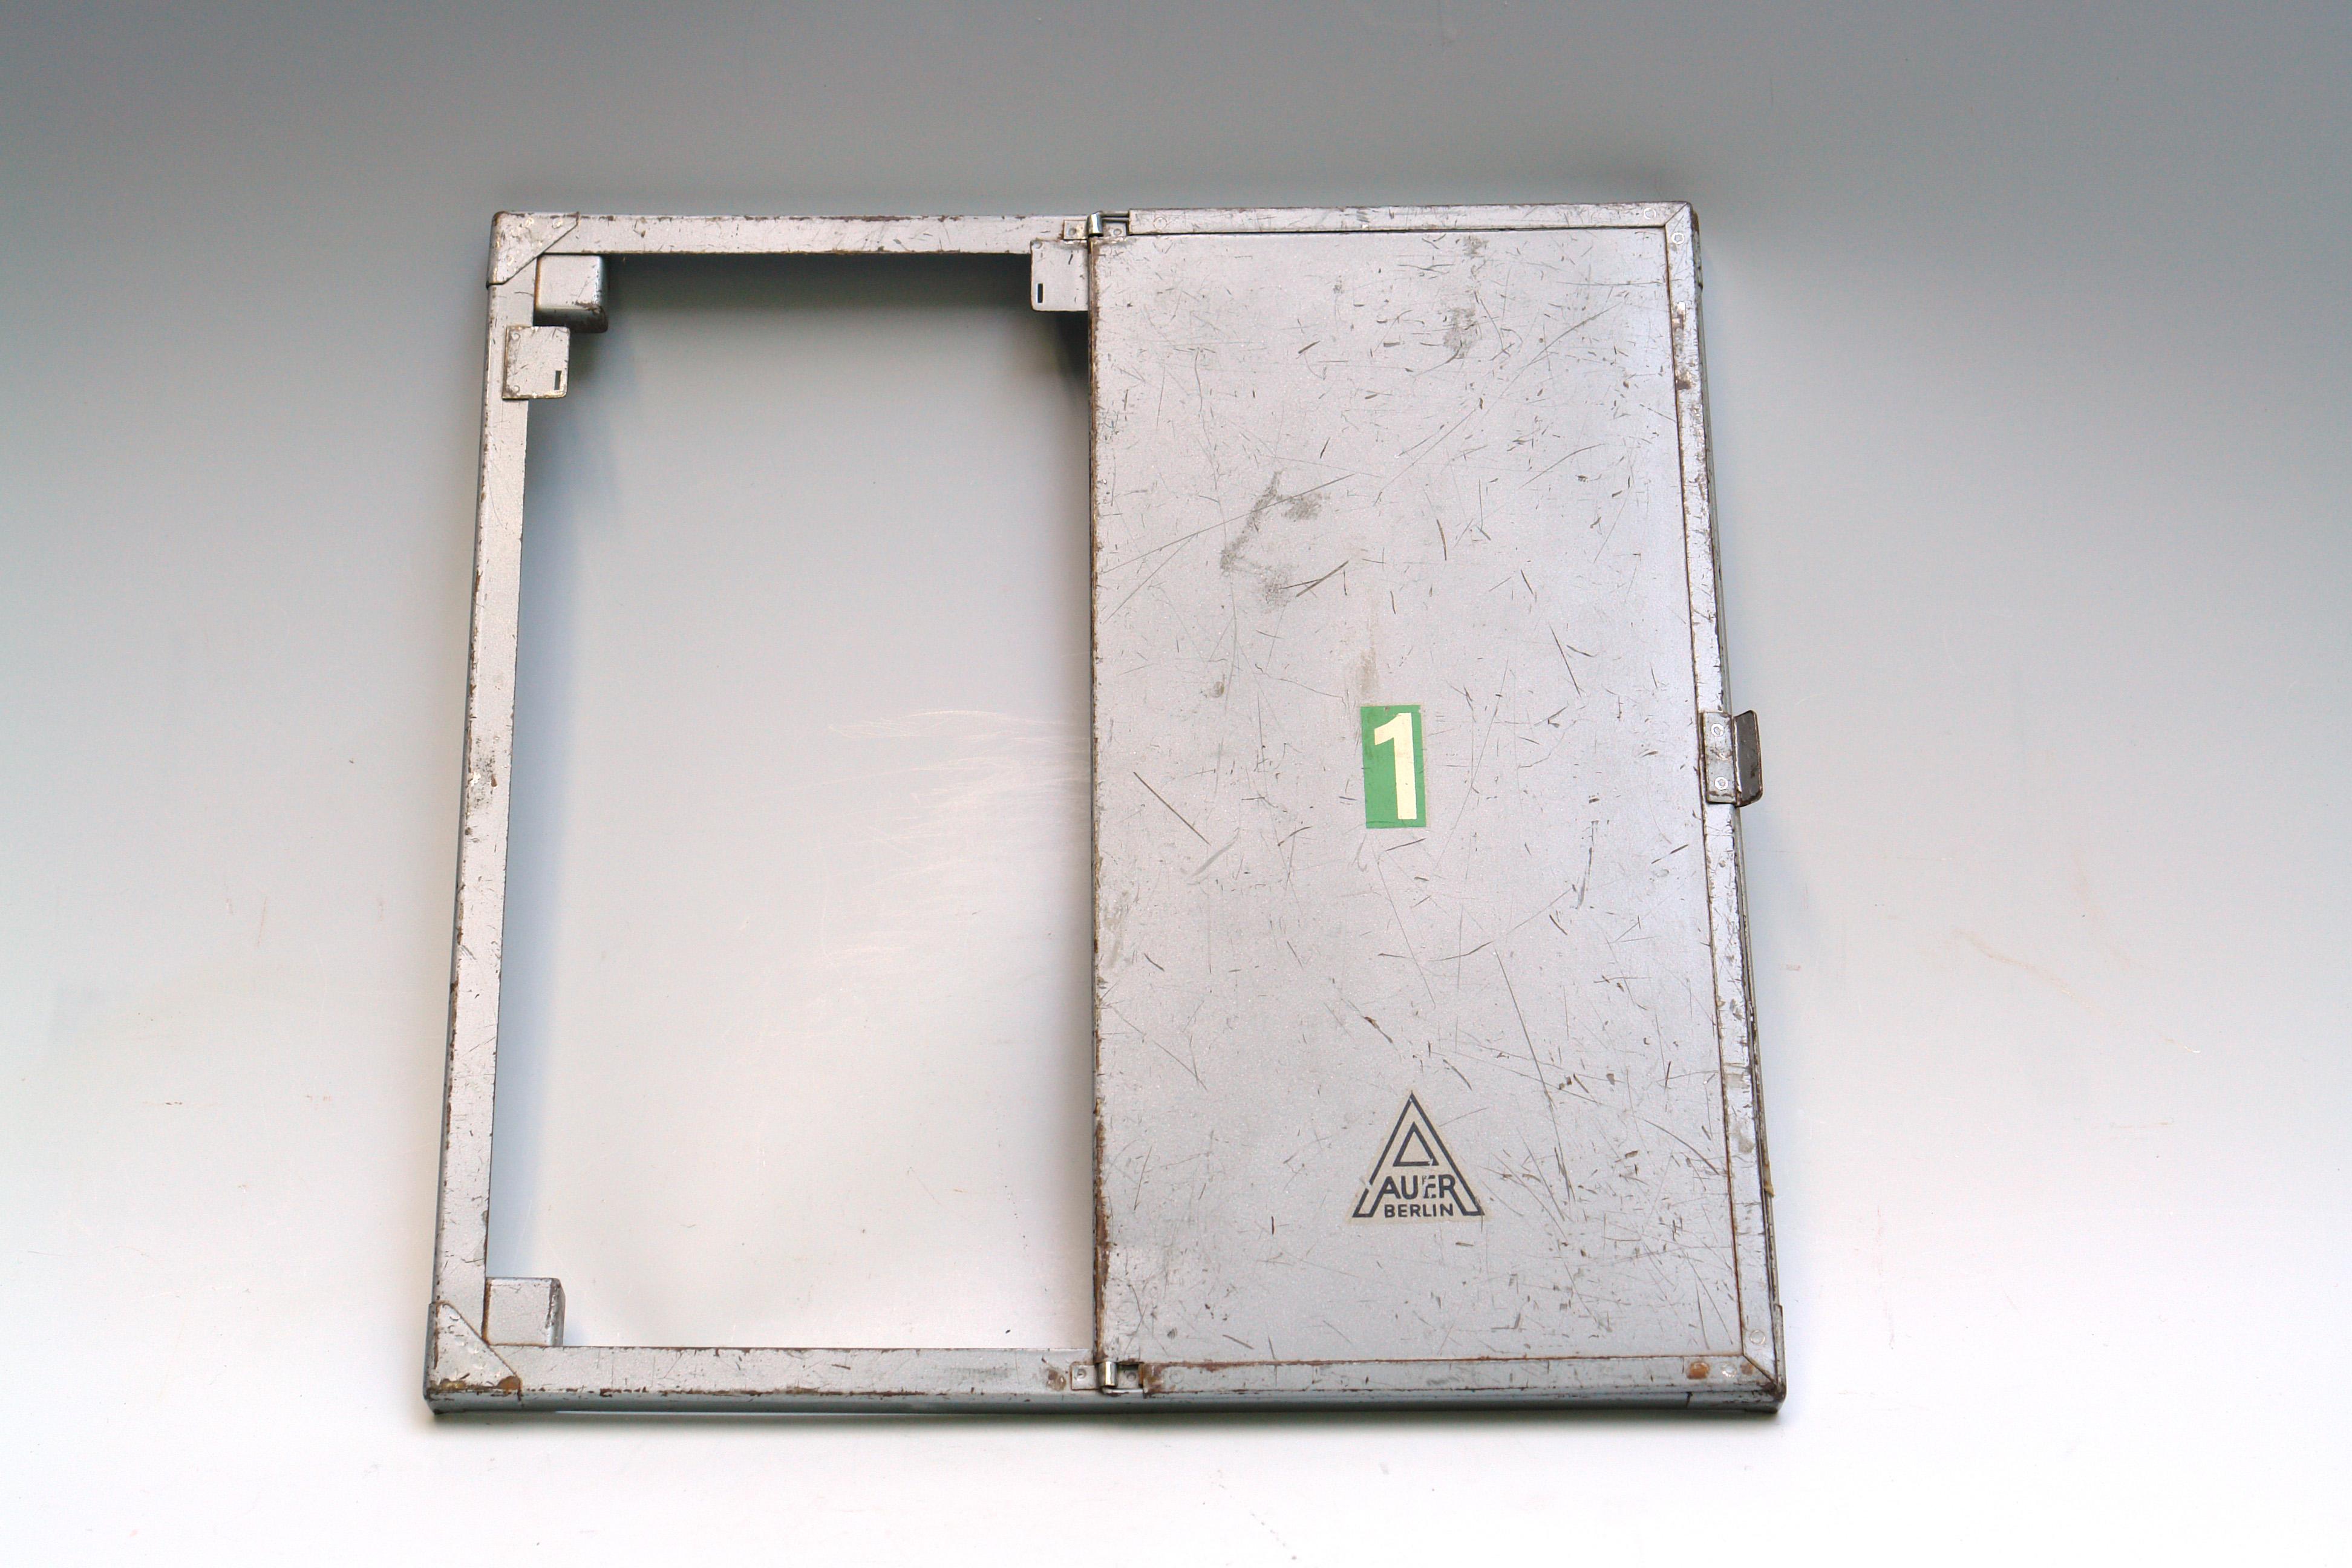 Röntgenplaten met scharnier, 1960-1990